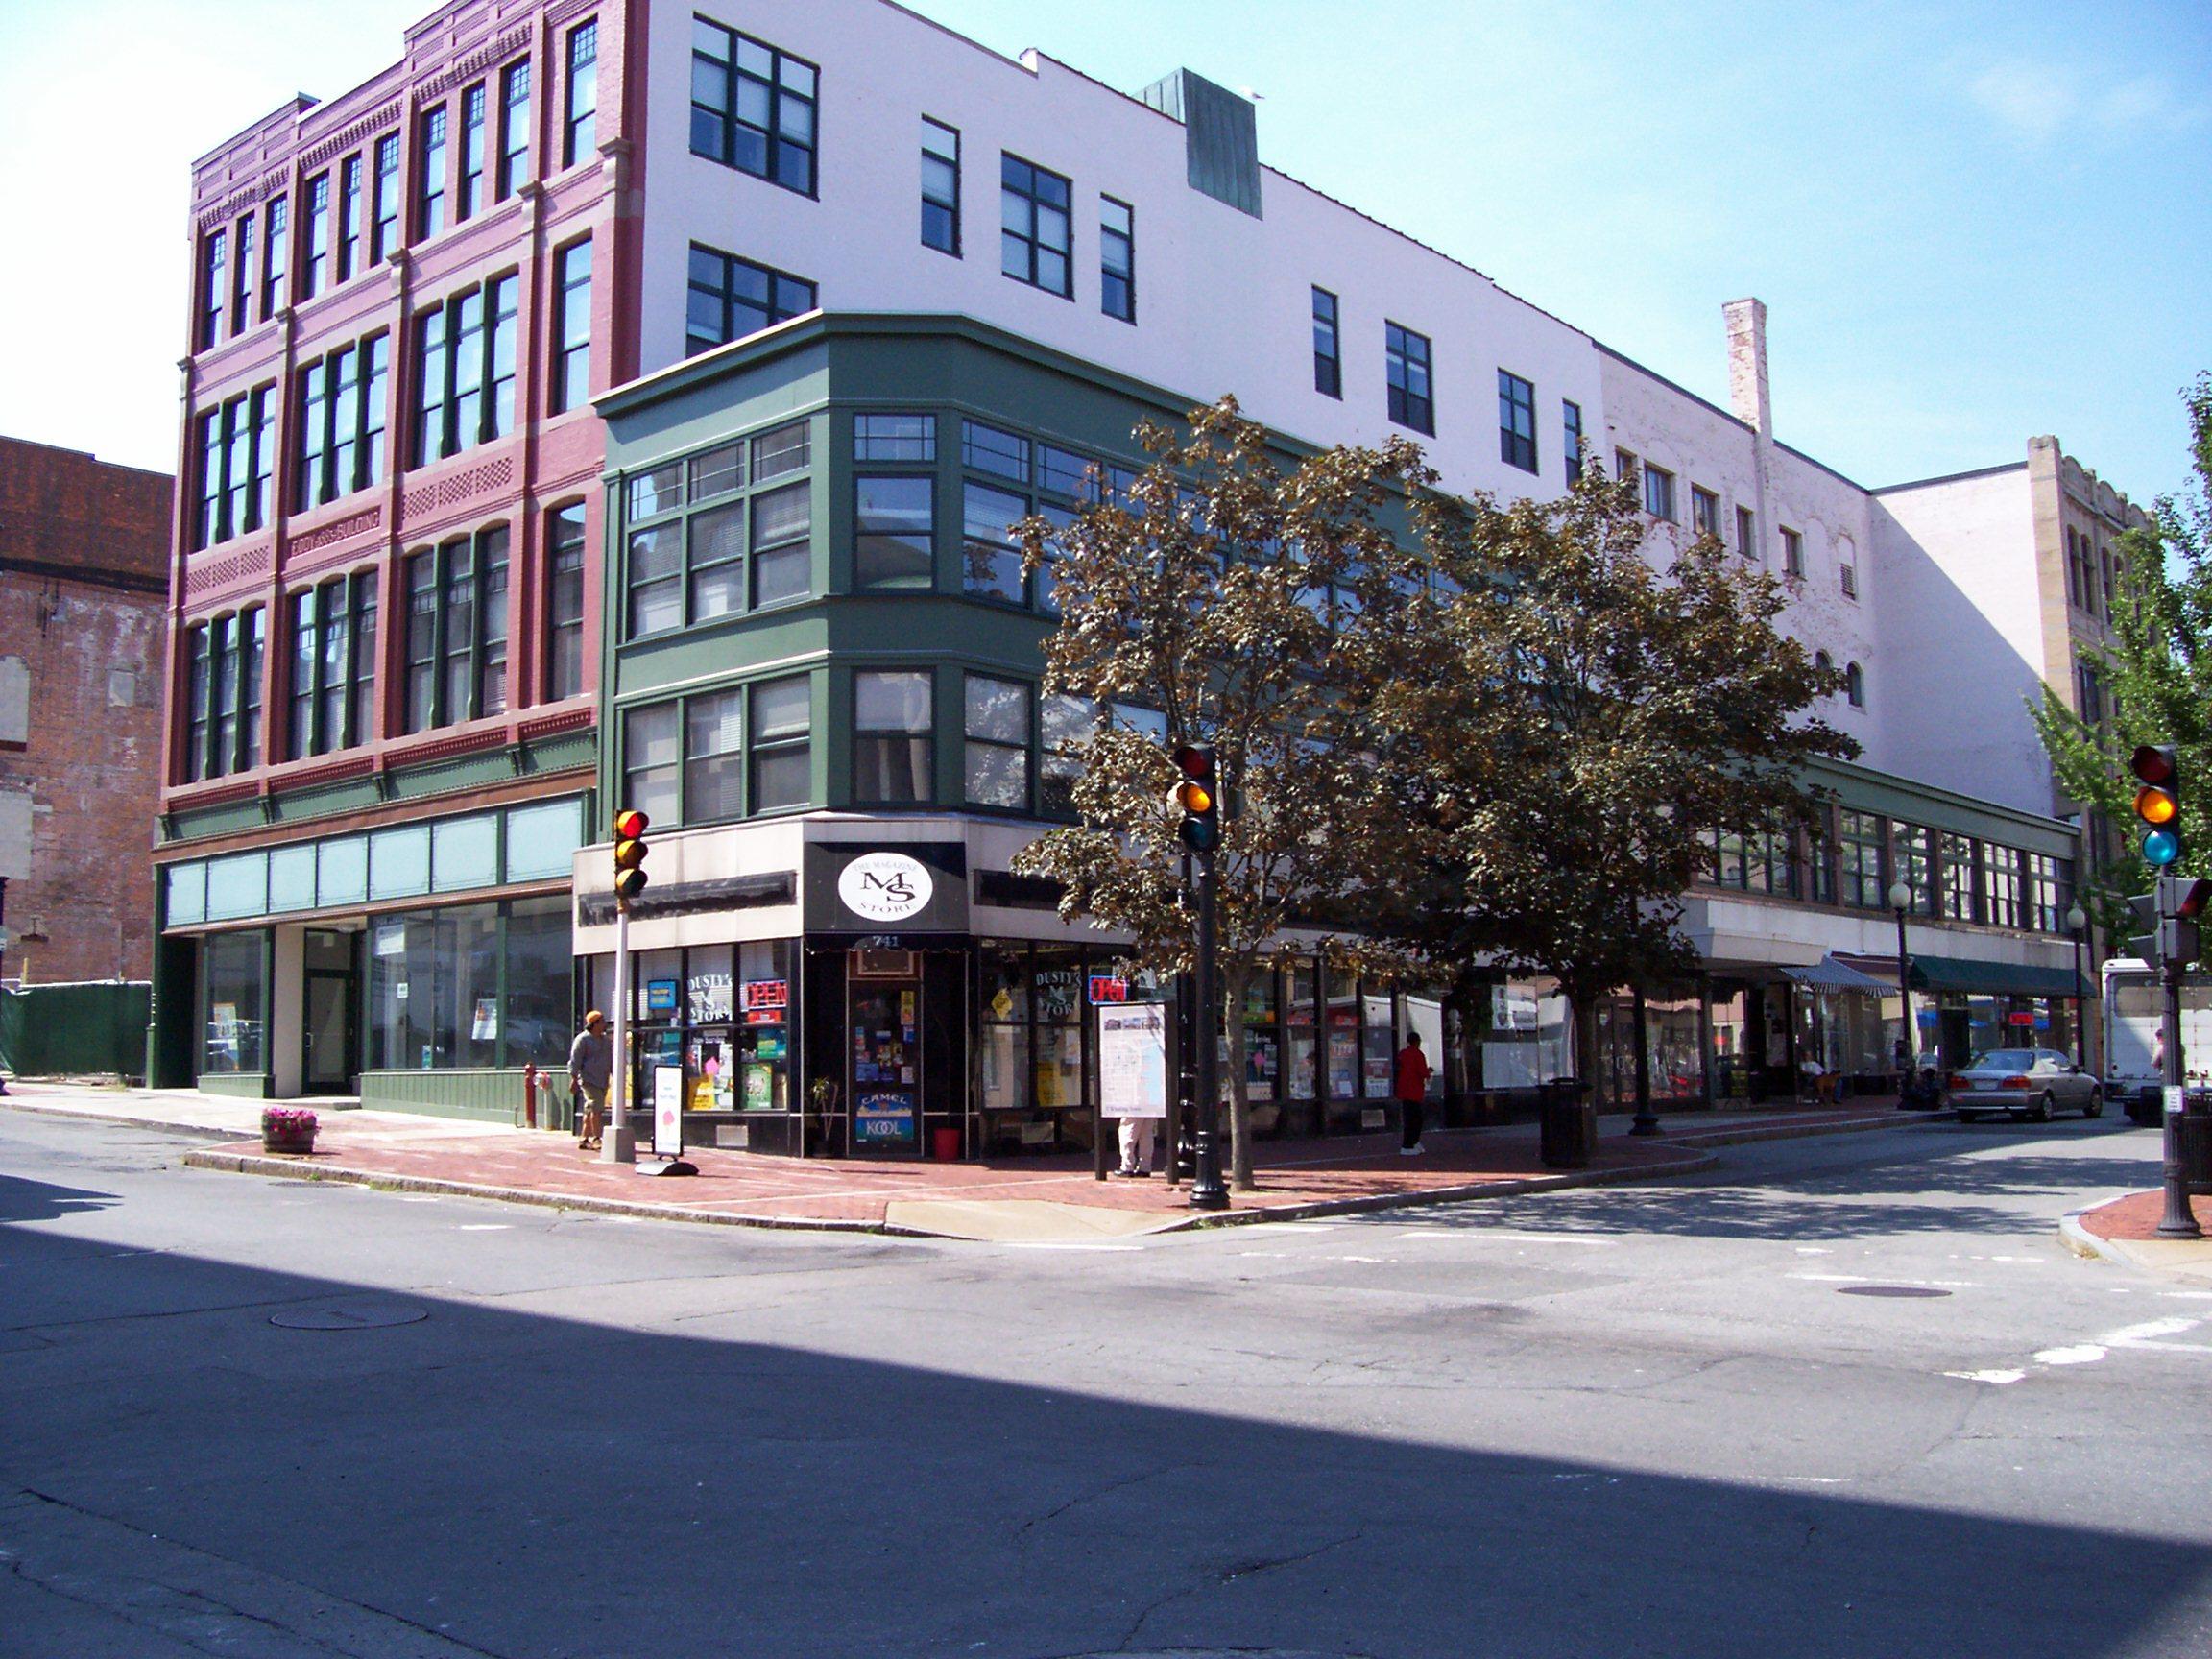 Union Street Lofts